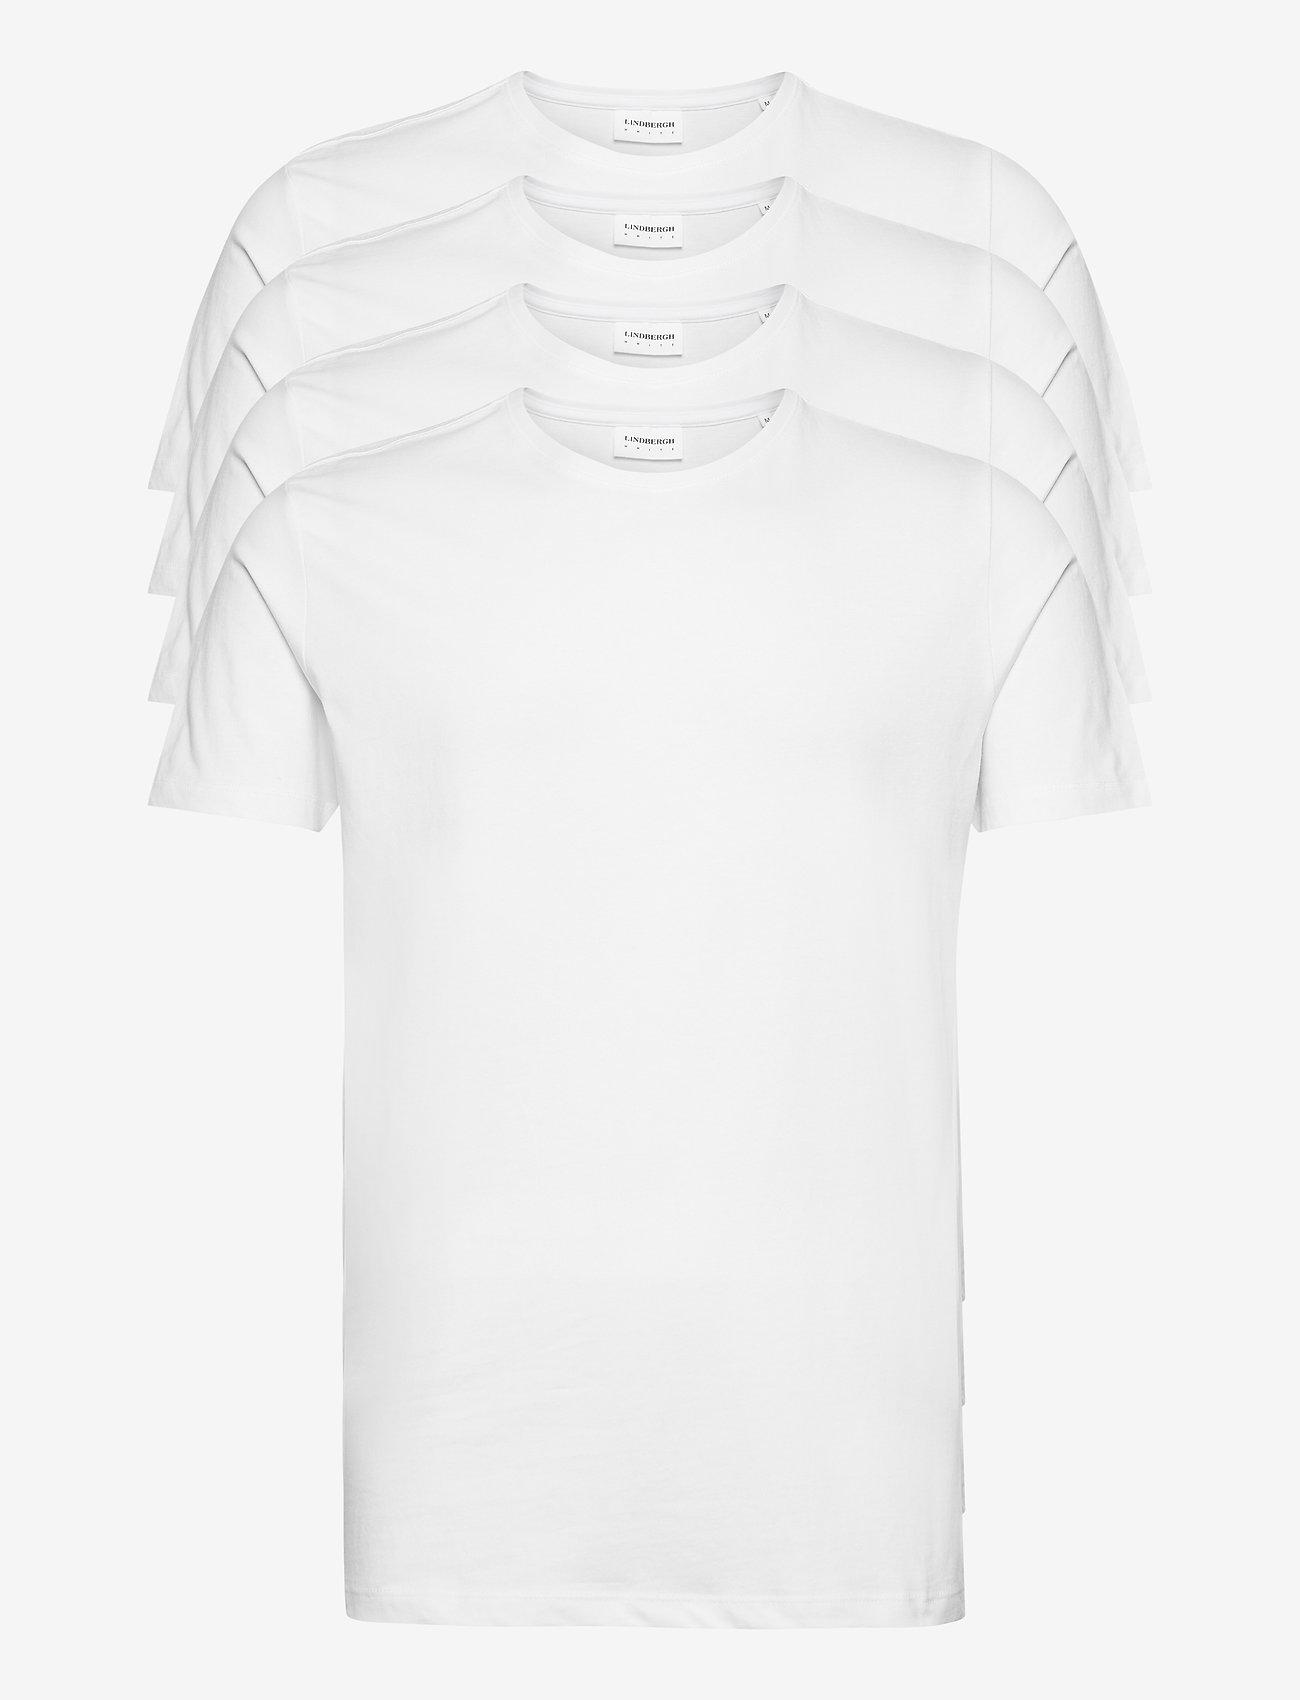 Lindbergh - Basic tee S/S - multipack - white - 0